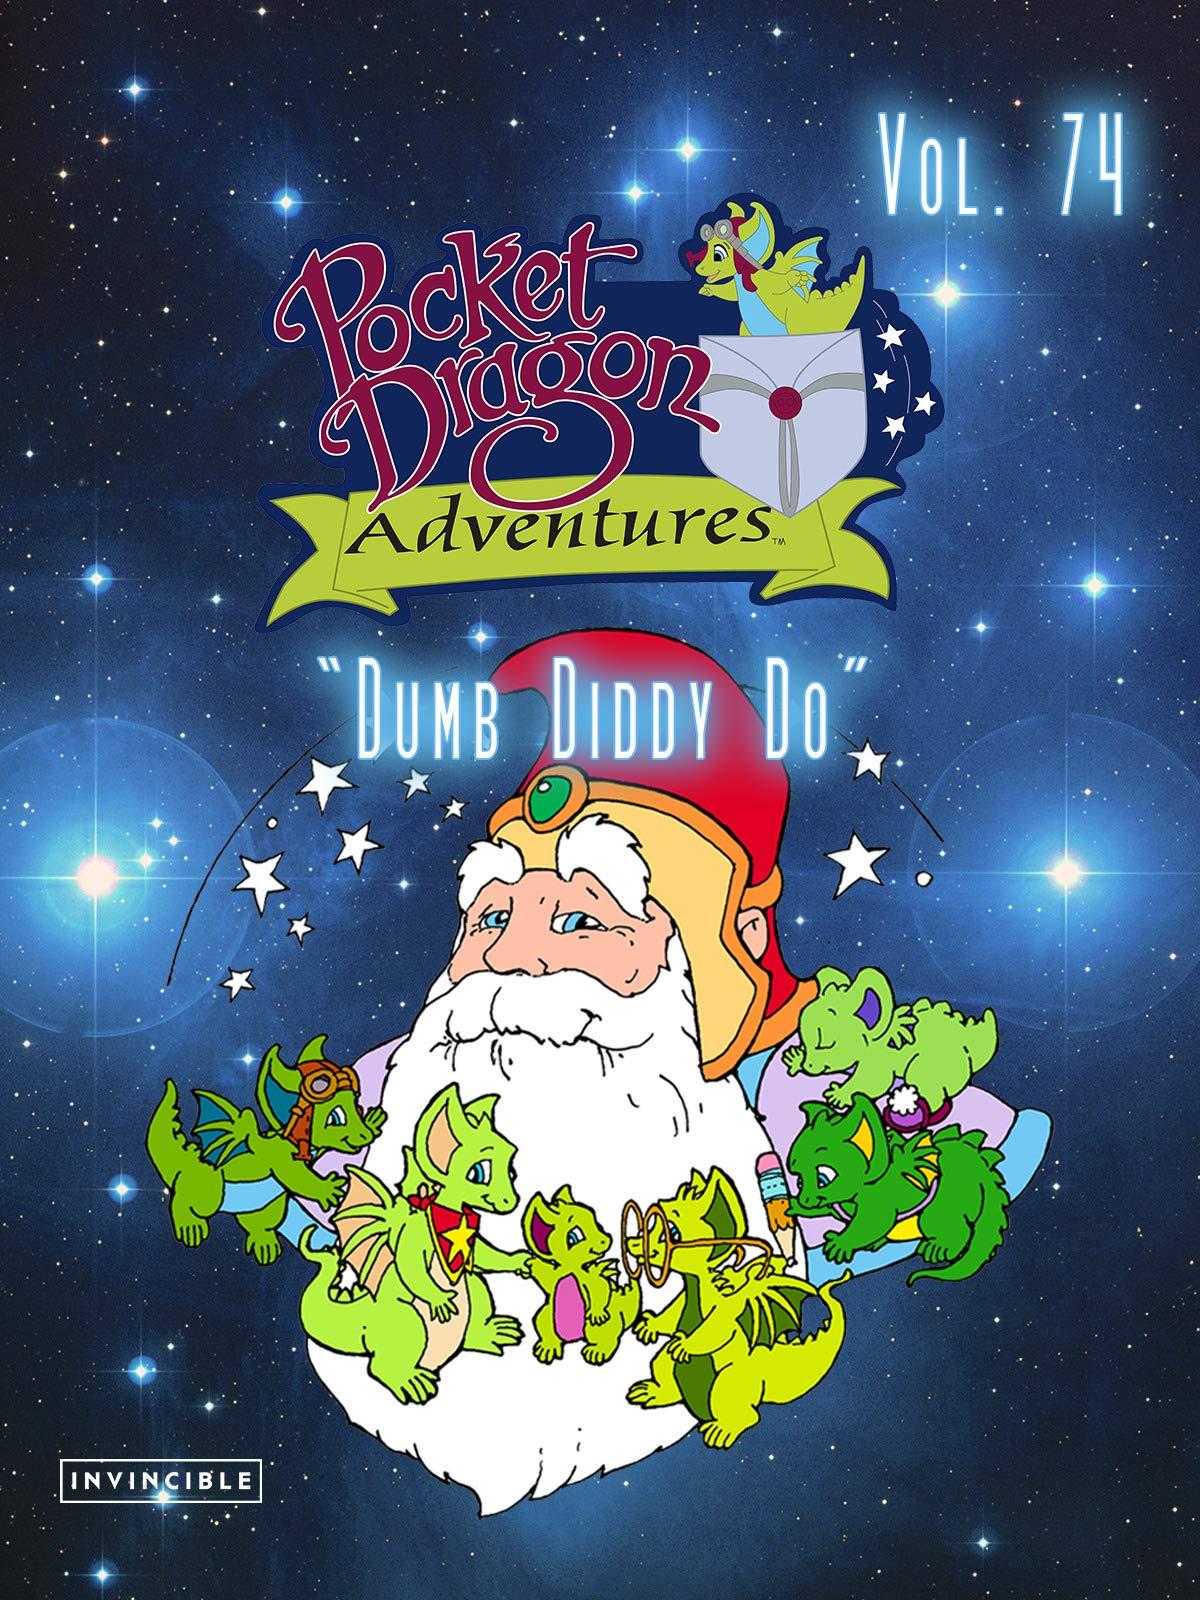 Pocket Dragon Adventures Vol. 74Dumb Diddy Do